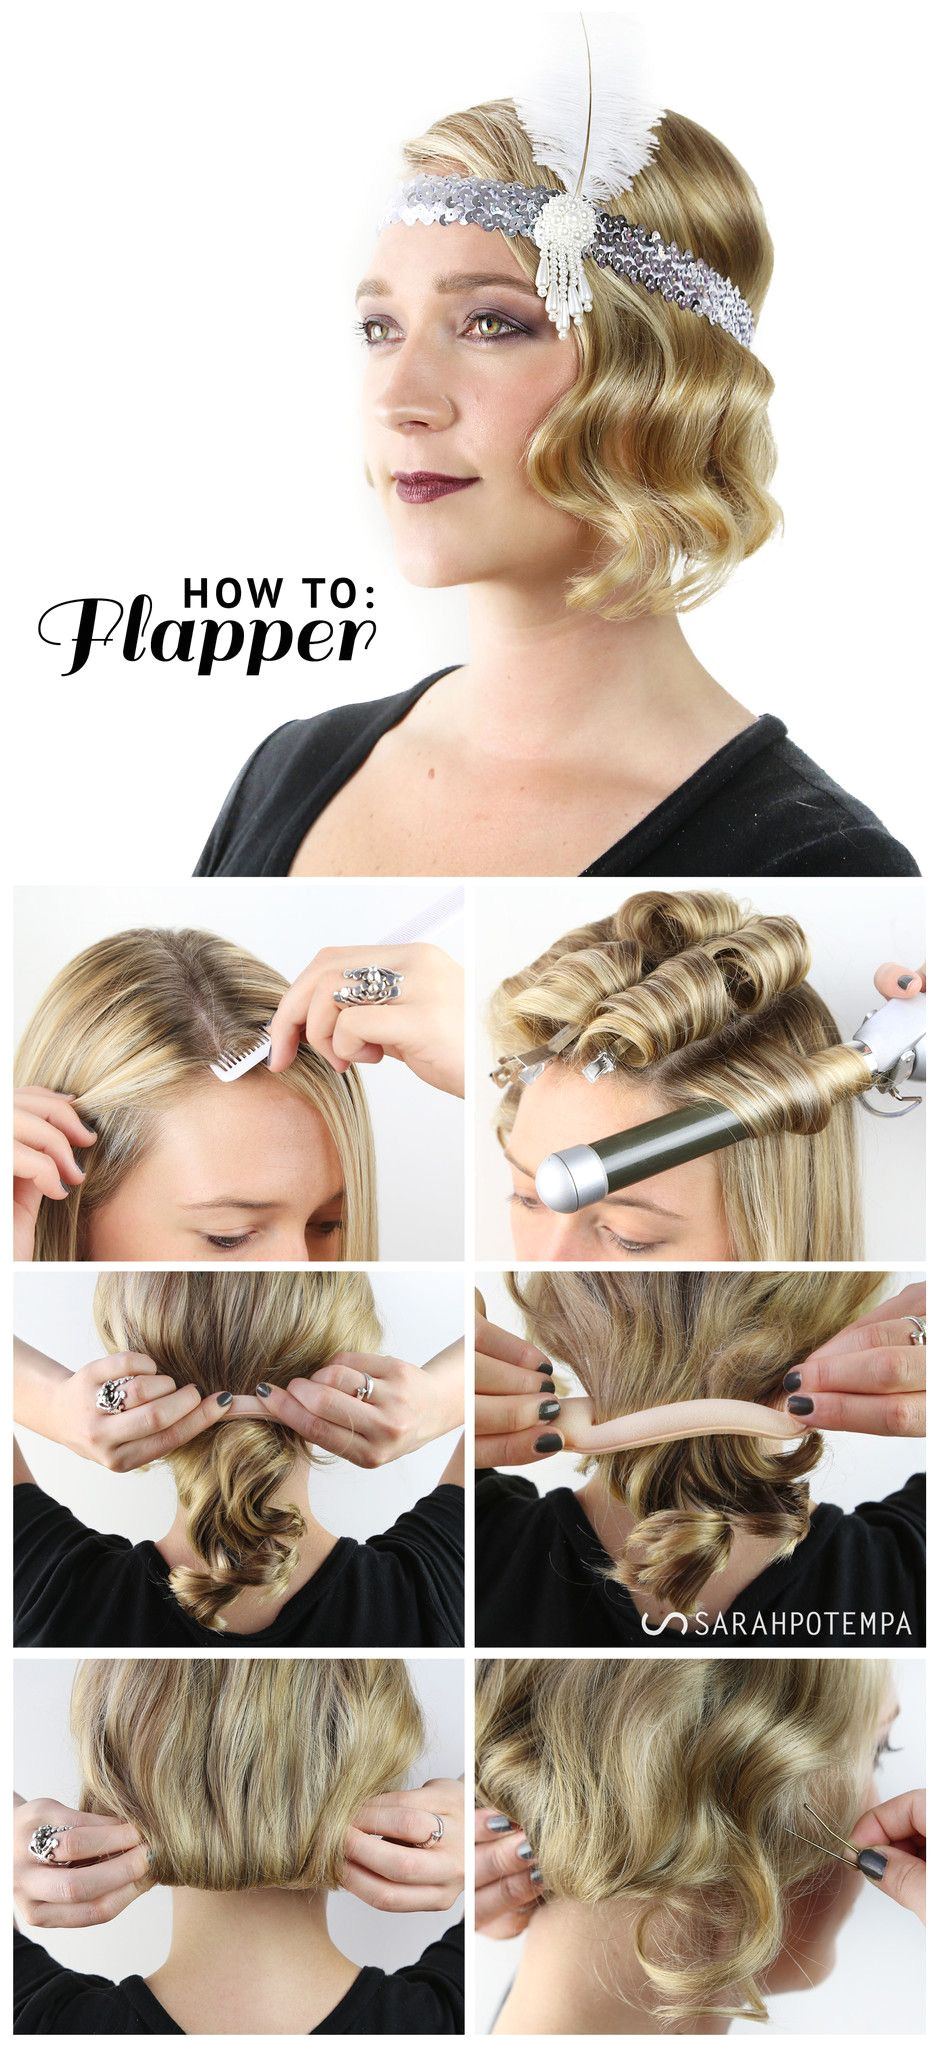 HALLOWEEN LOOK FABULOUS FLAPPER Finger waves using the Sarah Potempa Beachwaver Pro